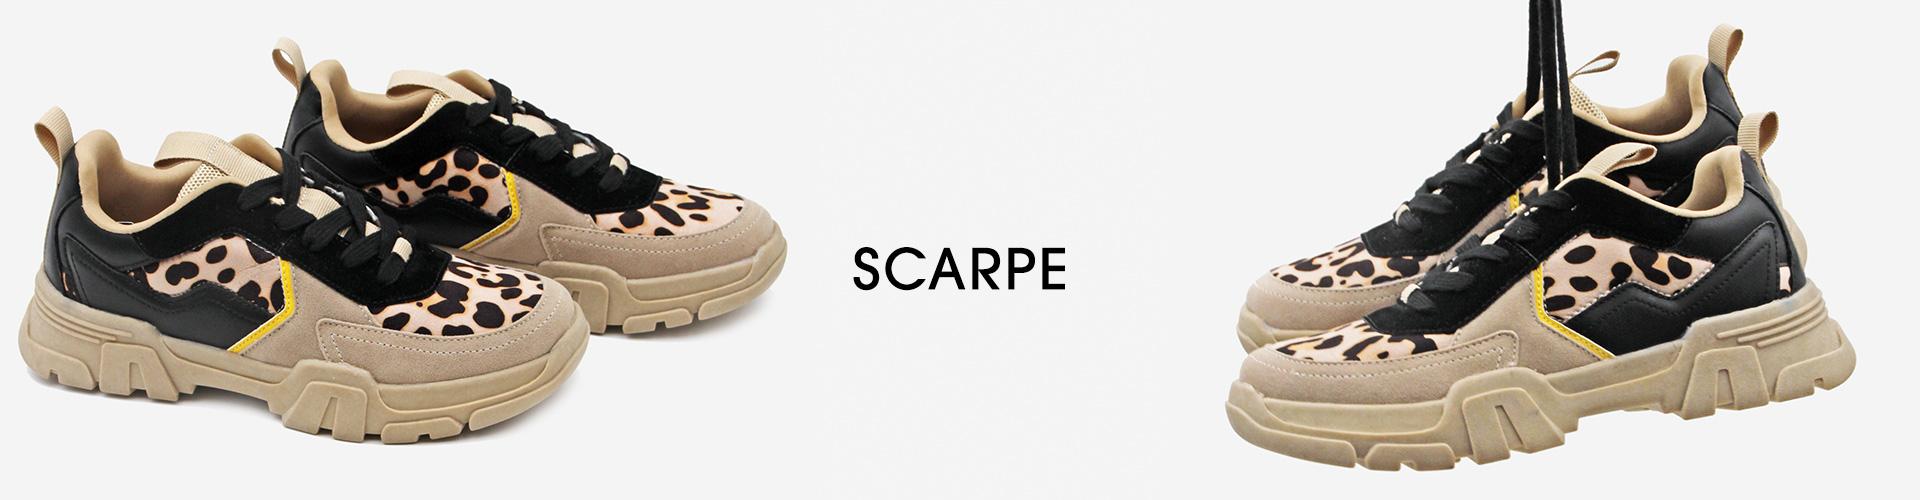 buy popular 37766 a3ee2 Scarpe Donna: sandali e sneakers | Acquista online su Alcott